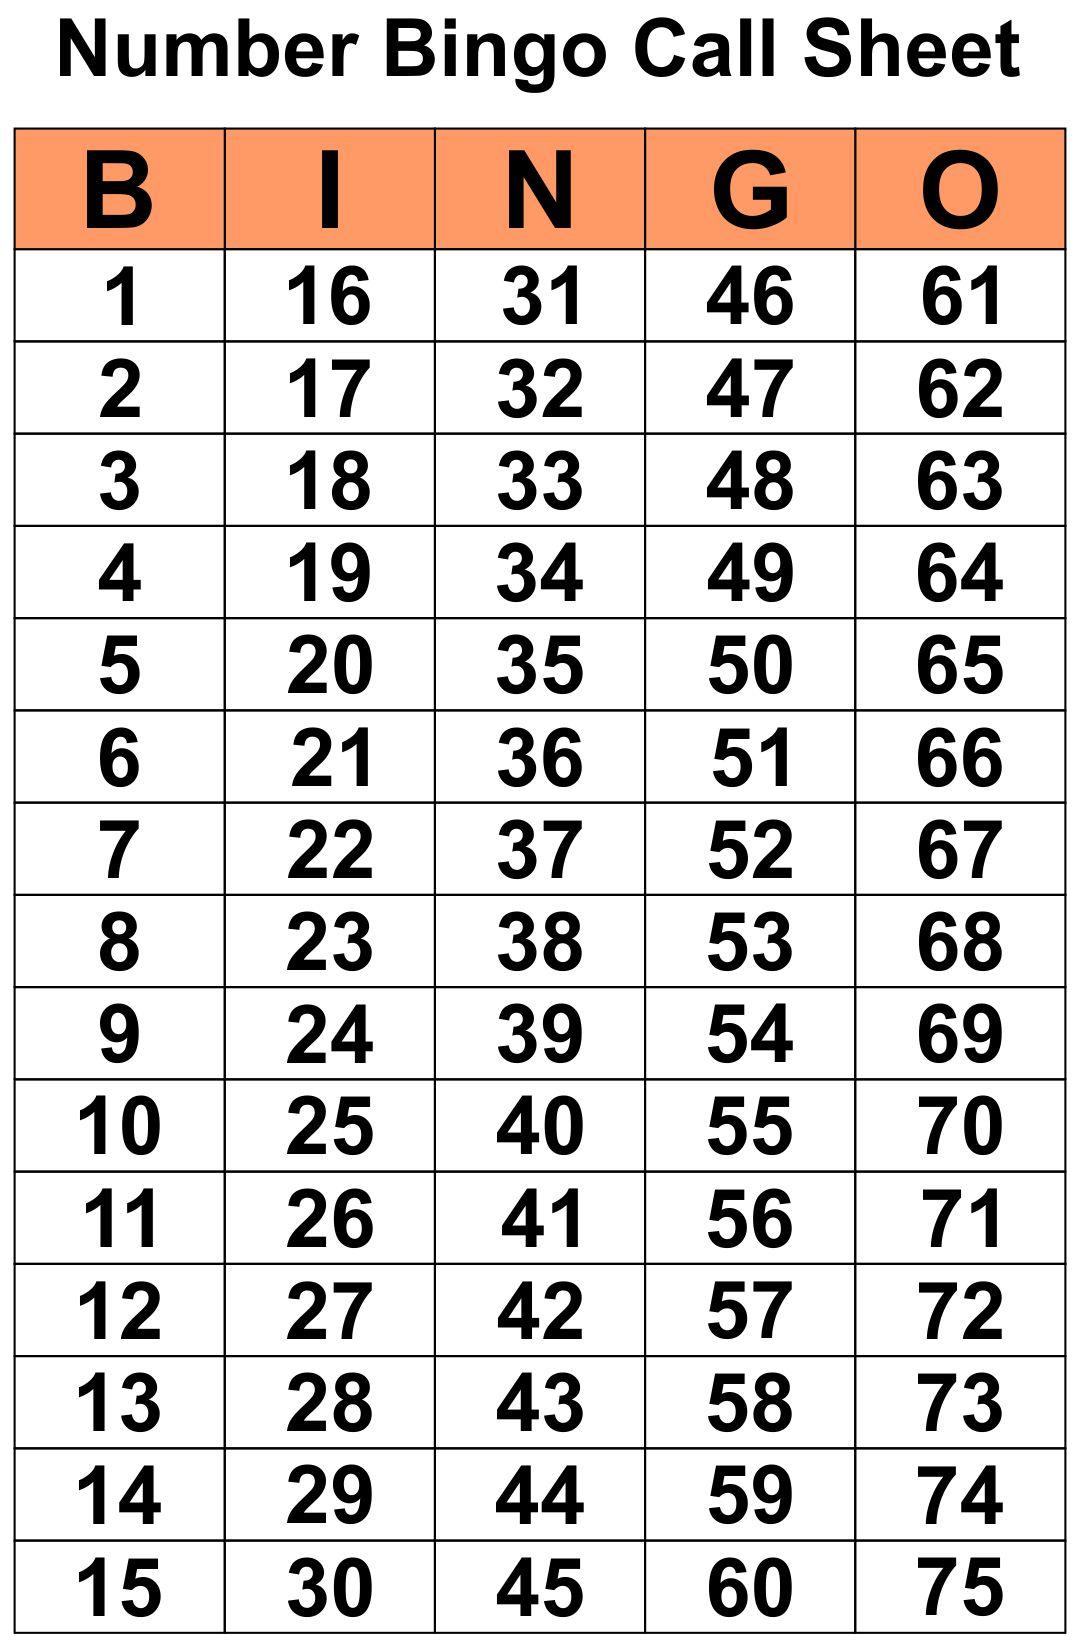 Printable Number Bingo Call Sheet